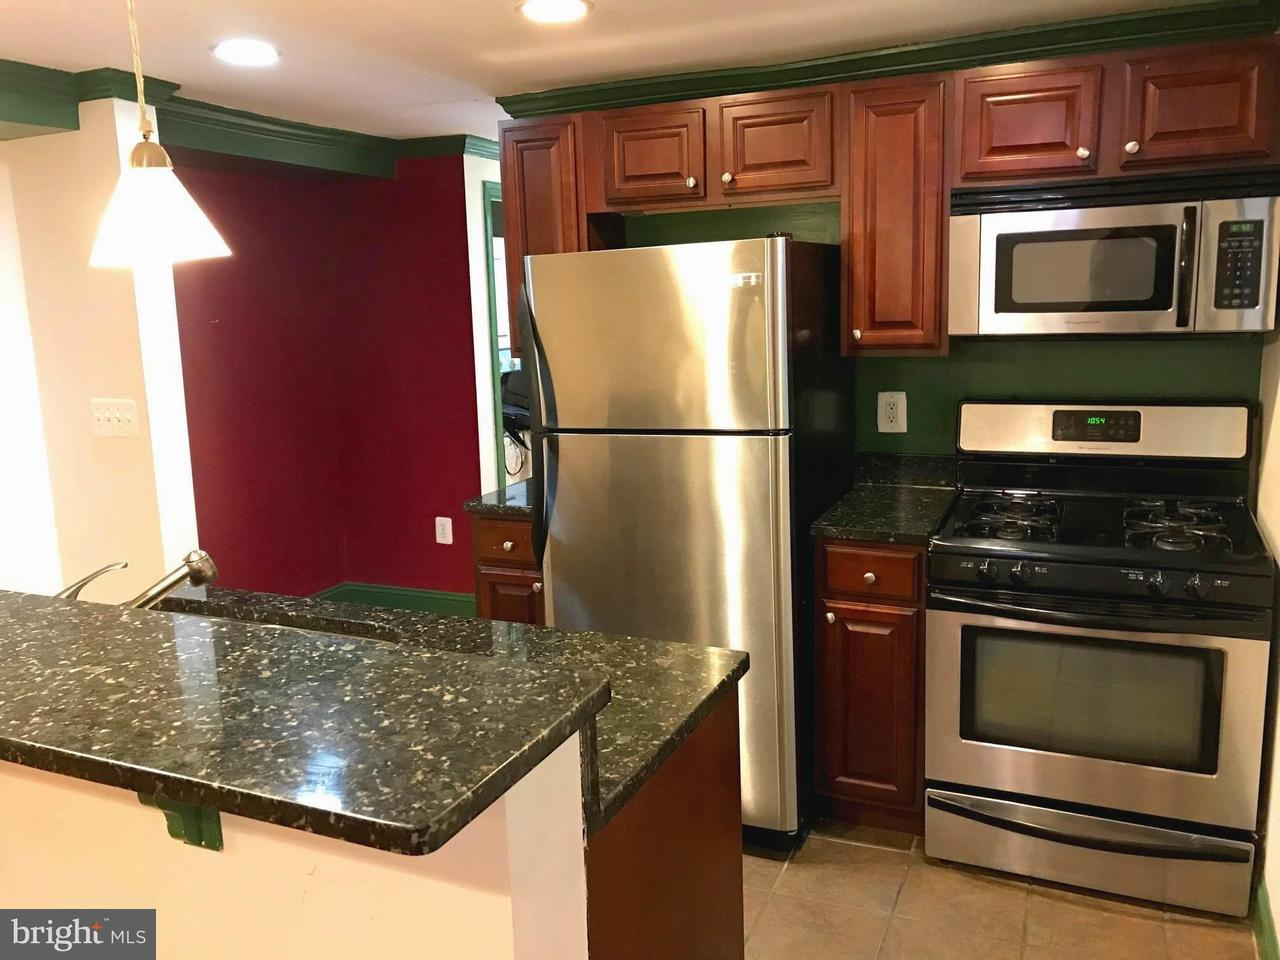 Condominium for Rent at 7300 Flower Ave #2 Takoma Park, Maryland 20912 United States